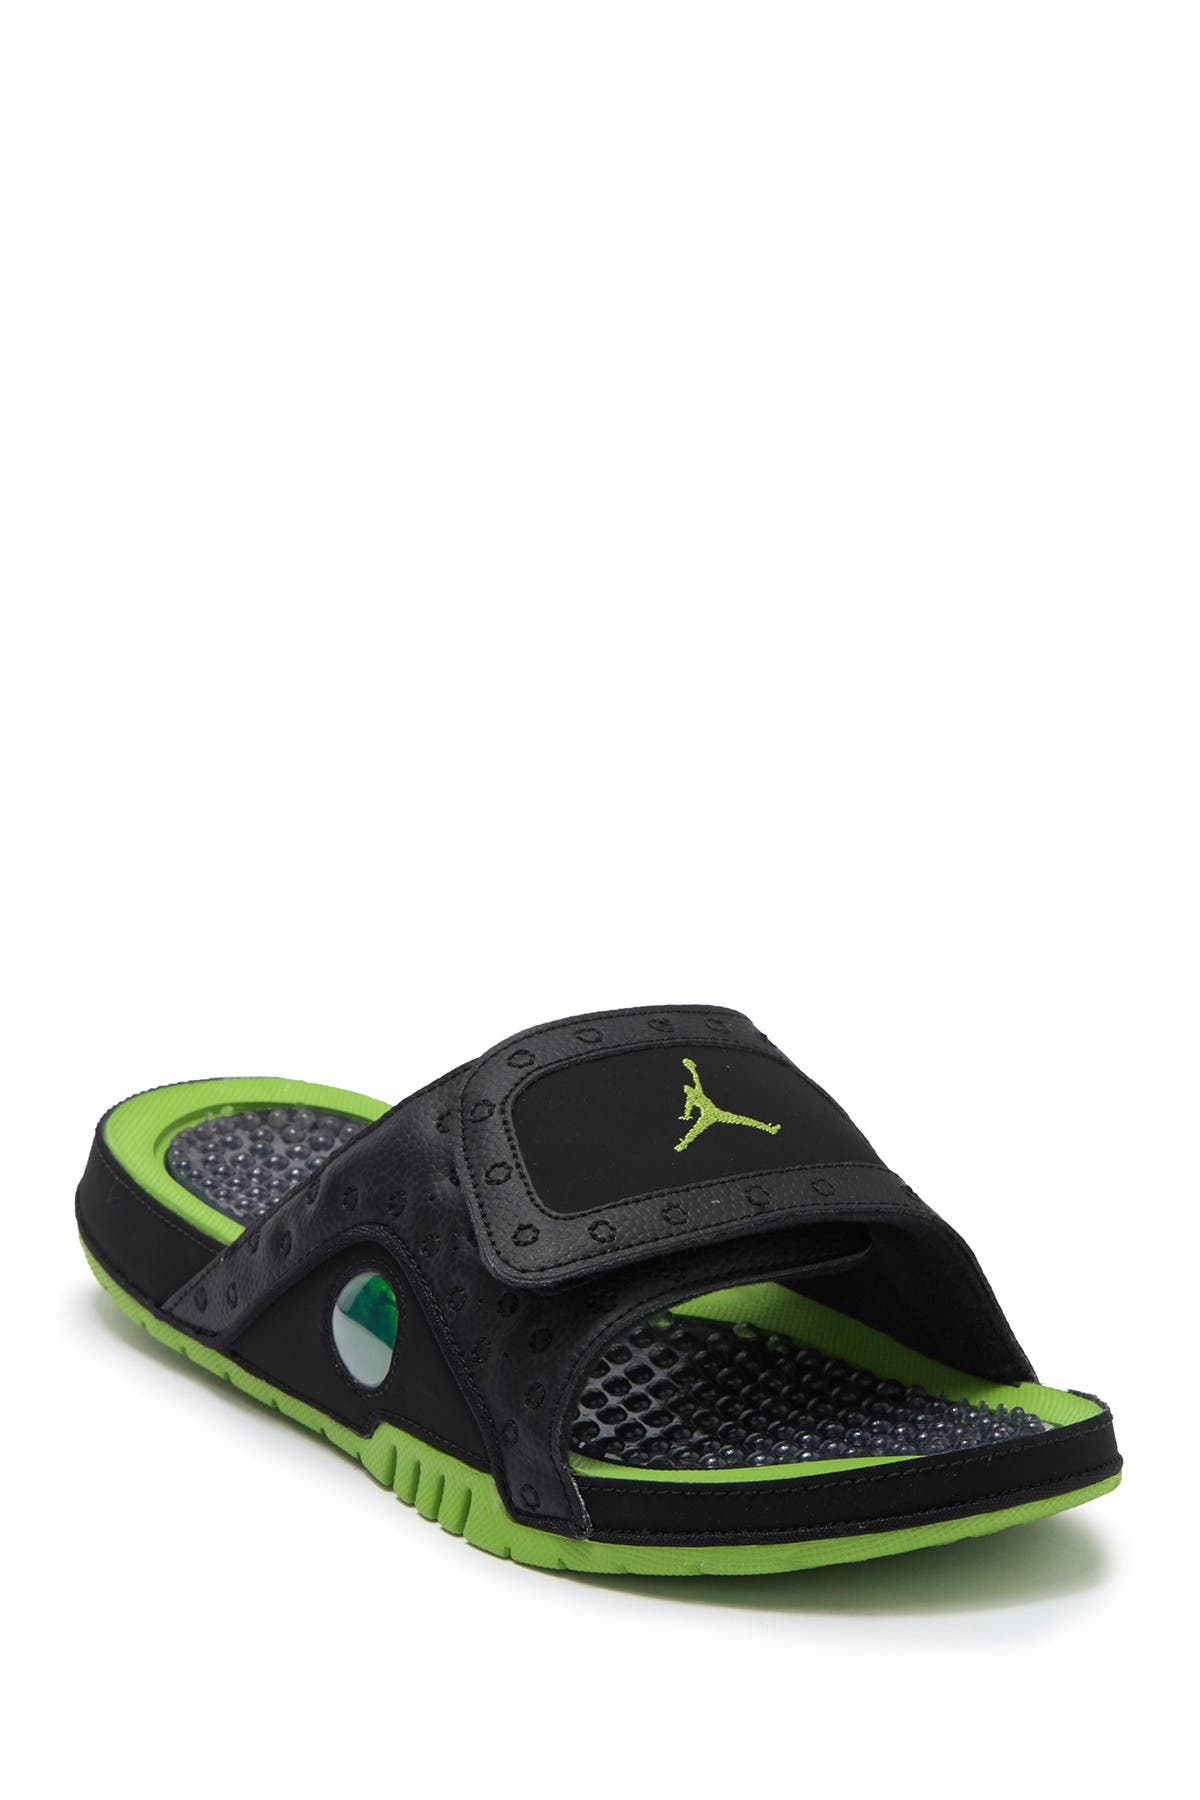 Nike | Jordan Hydro XIII Retro Slide